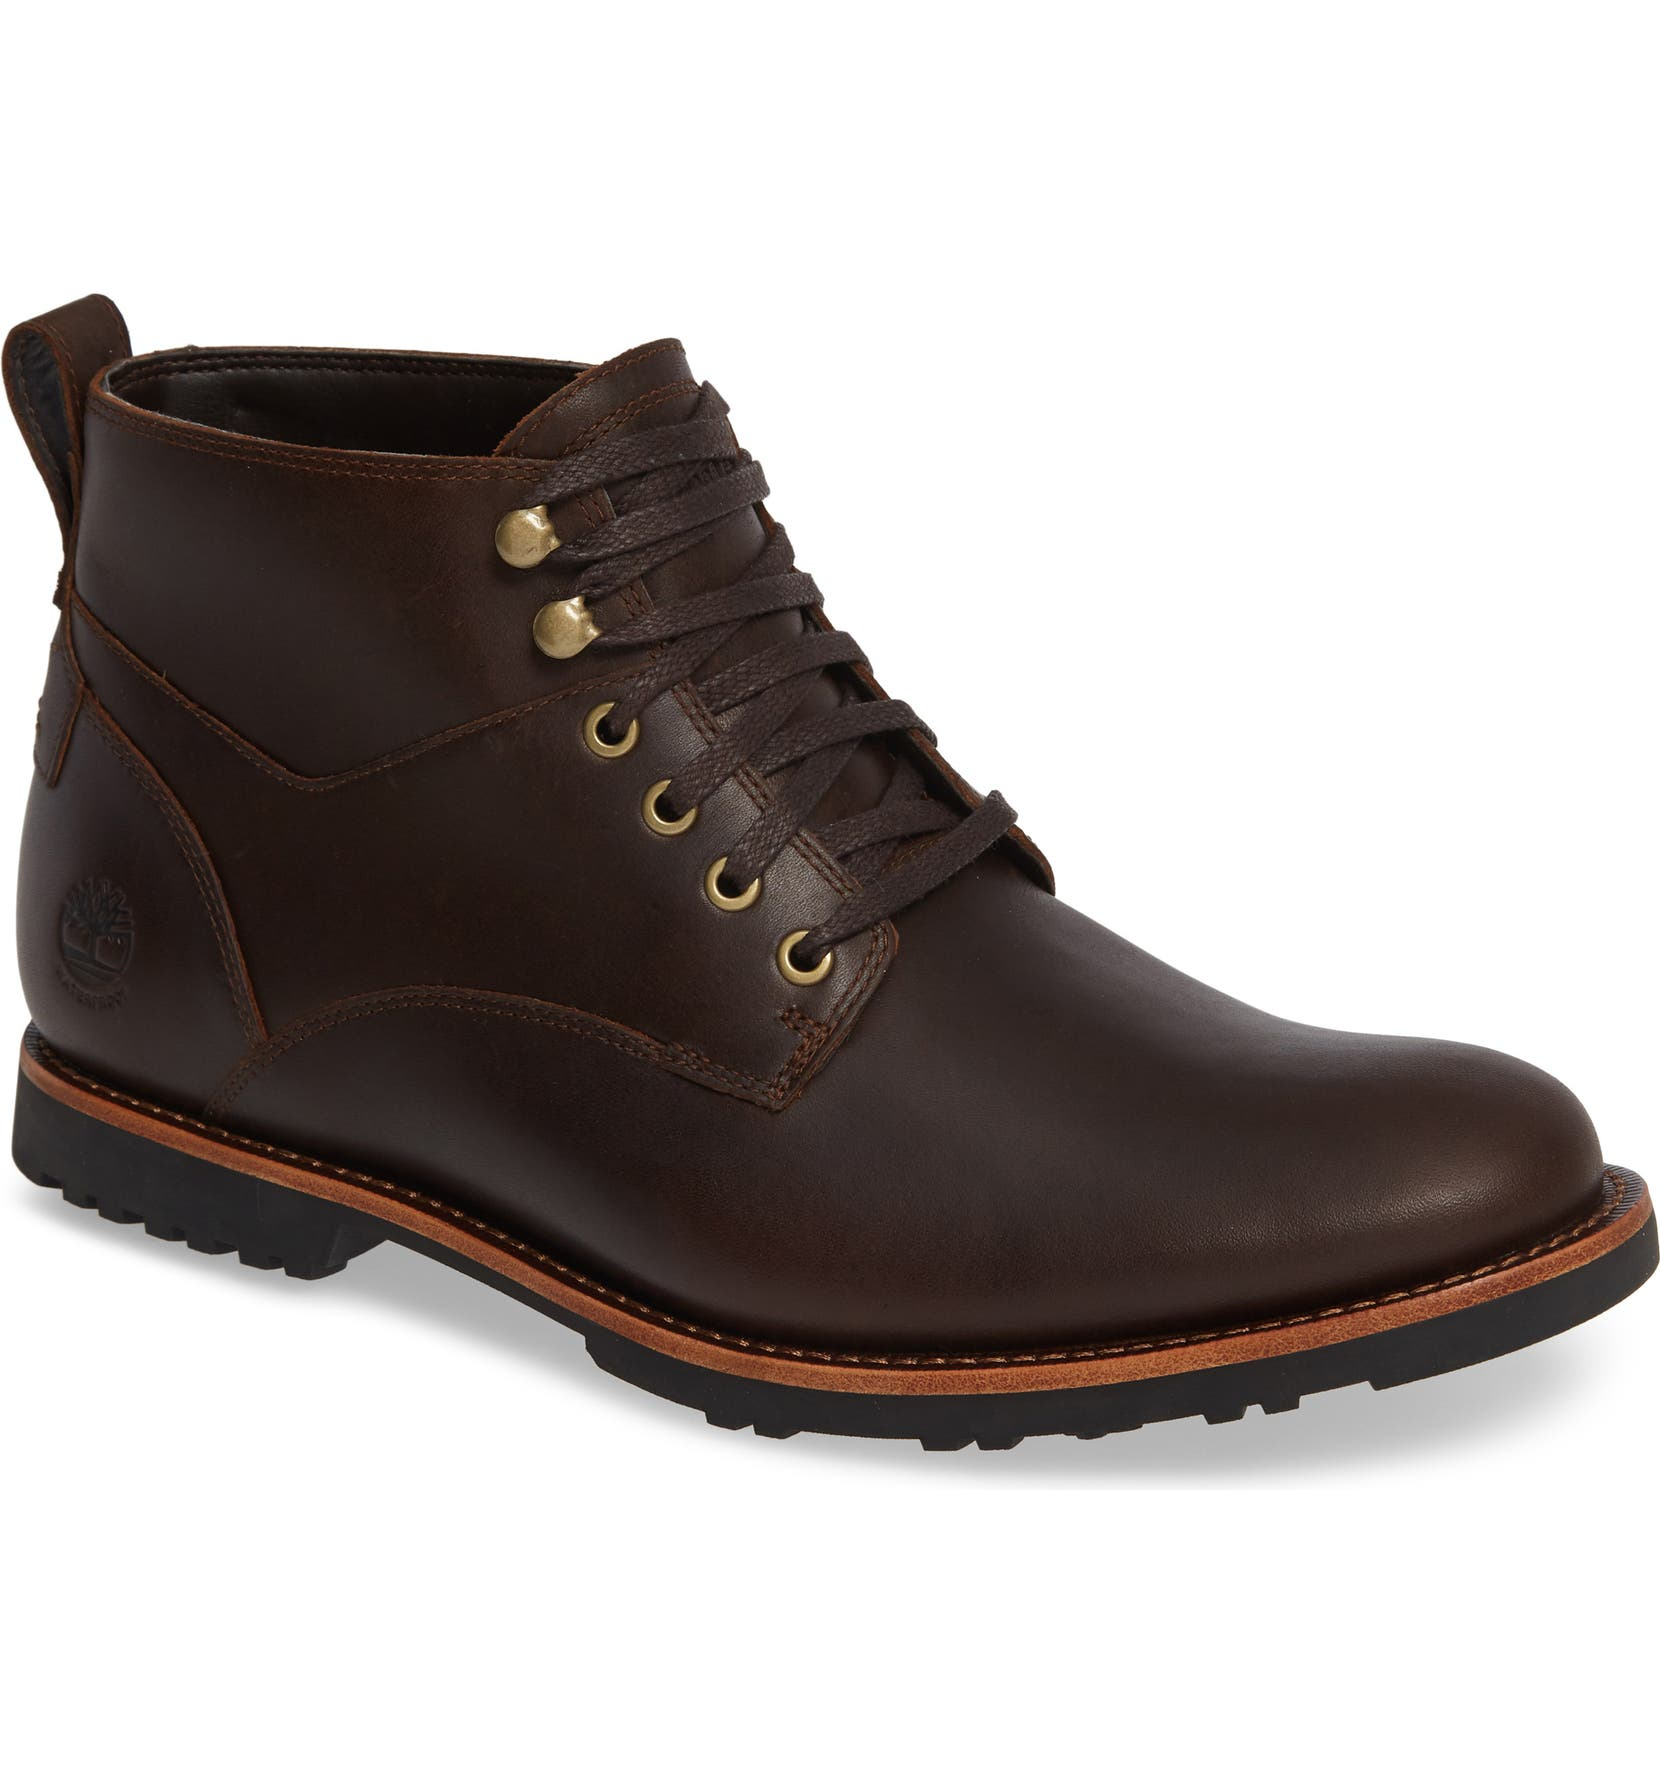 99739f27679 Kendrick Waterproof Chukka Boot